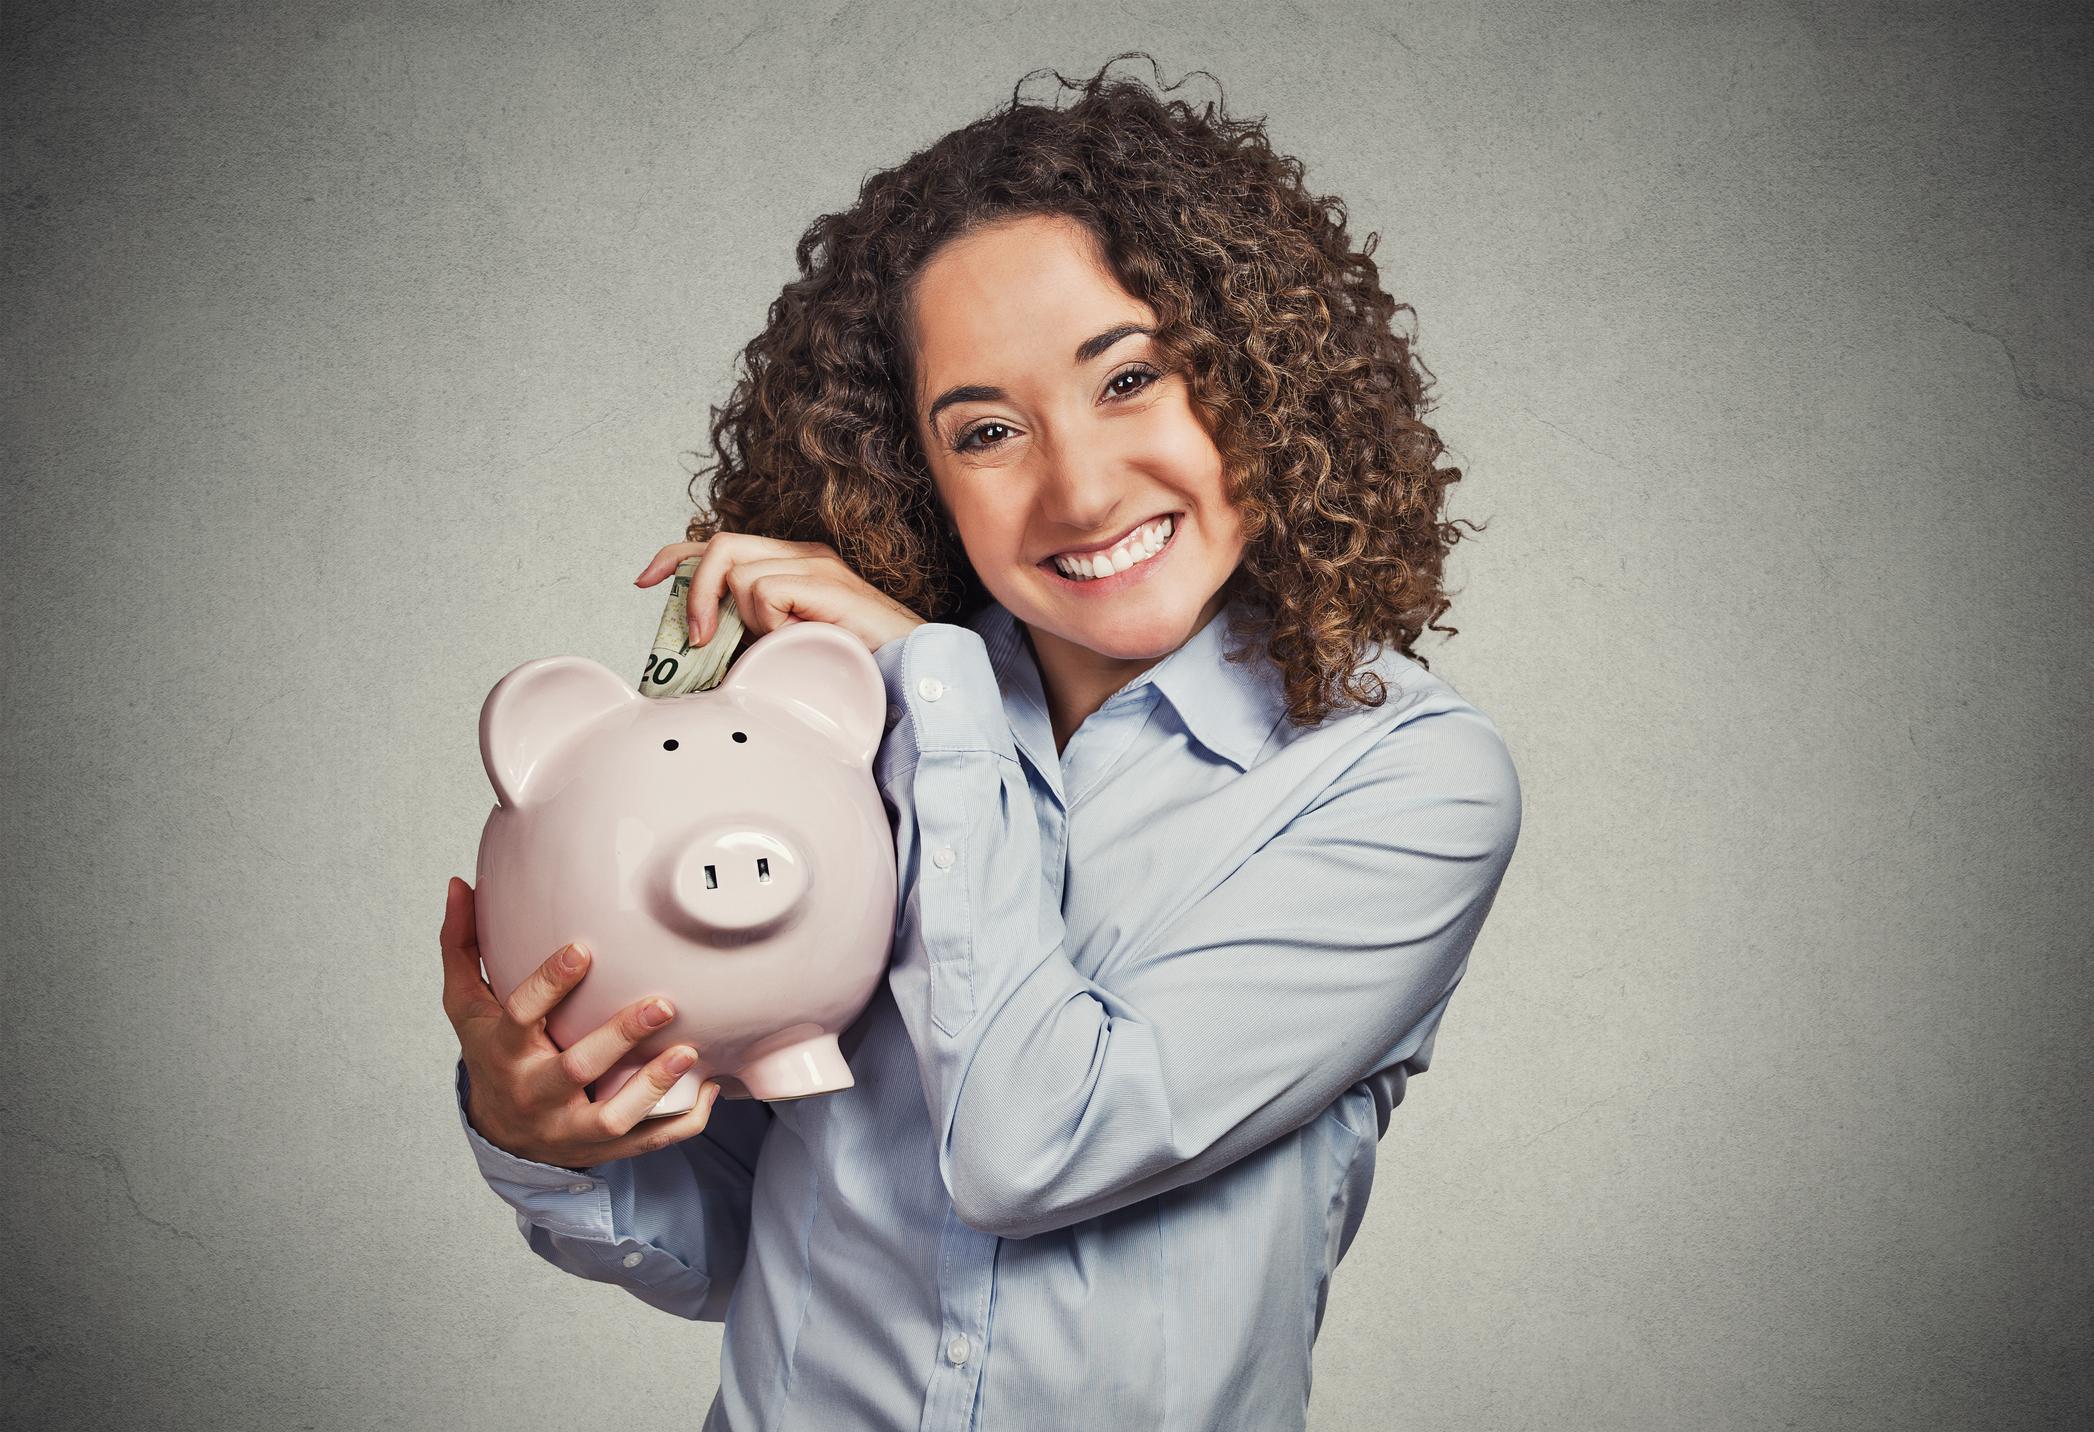 Woman putting money into a piggy bank